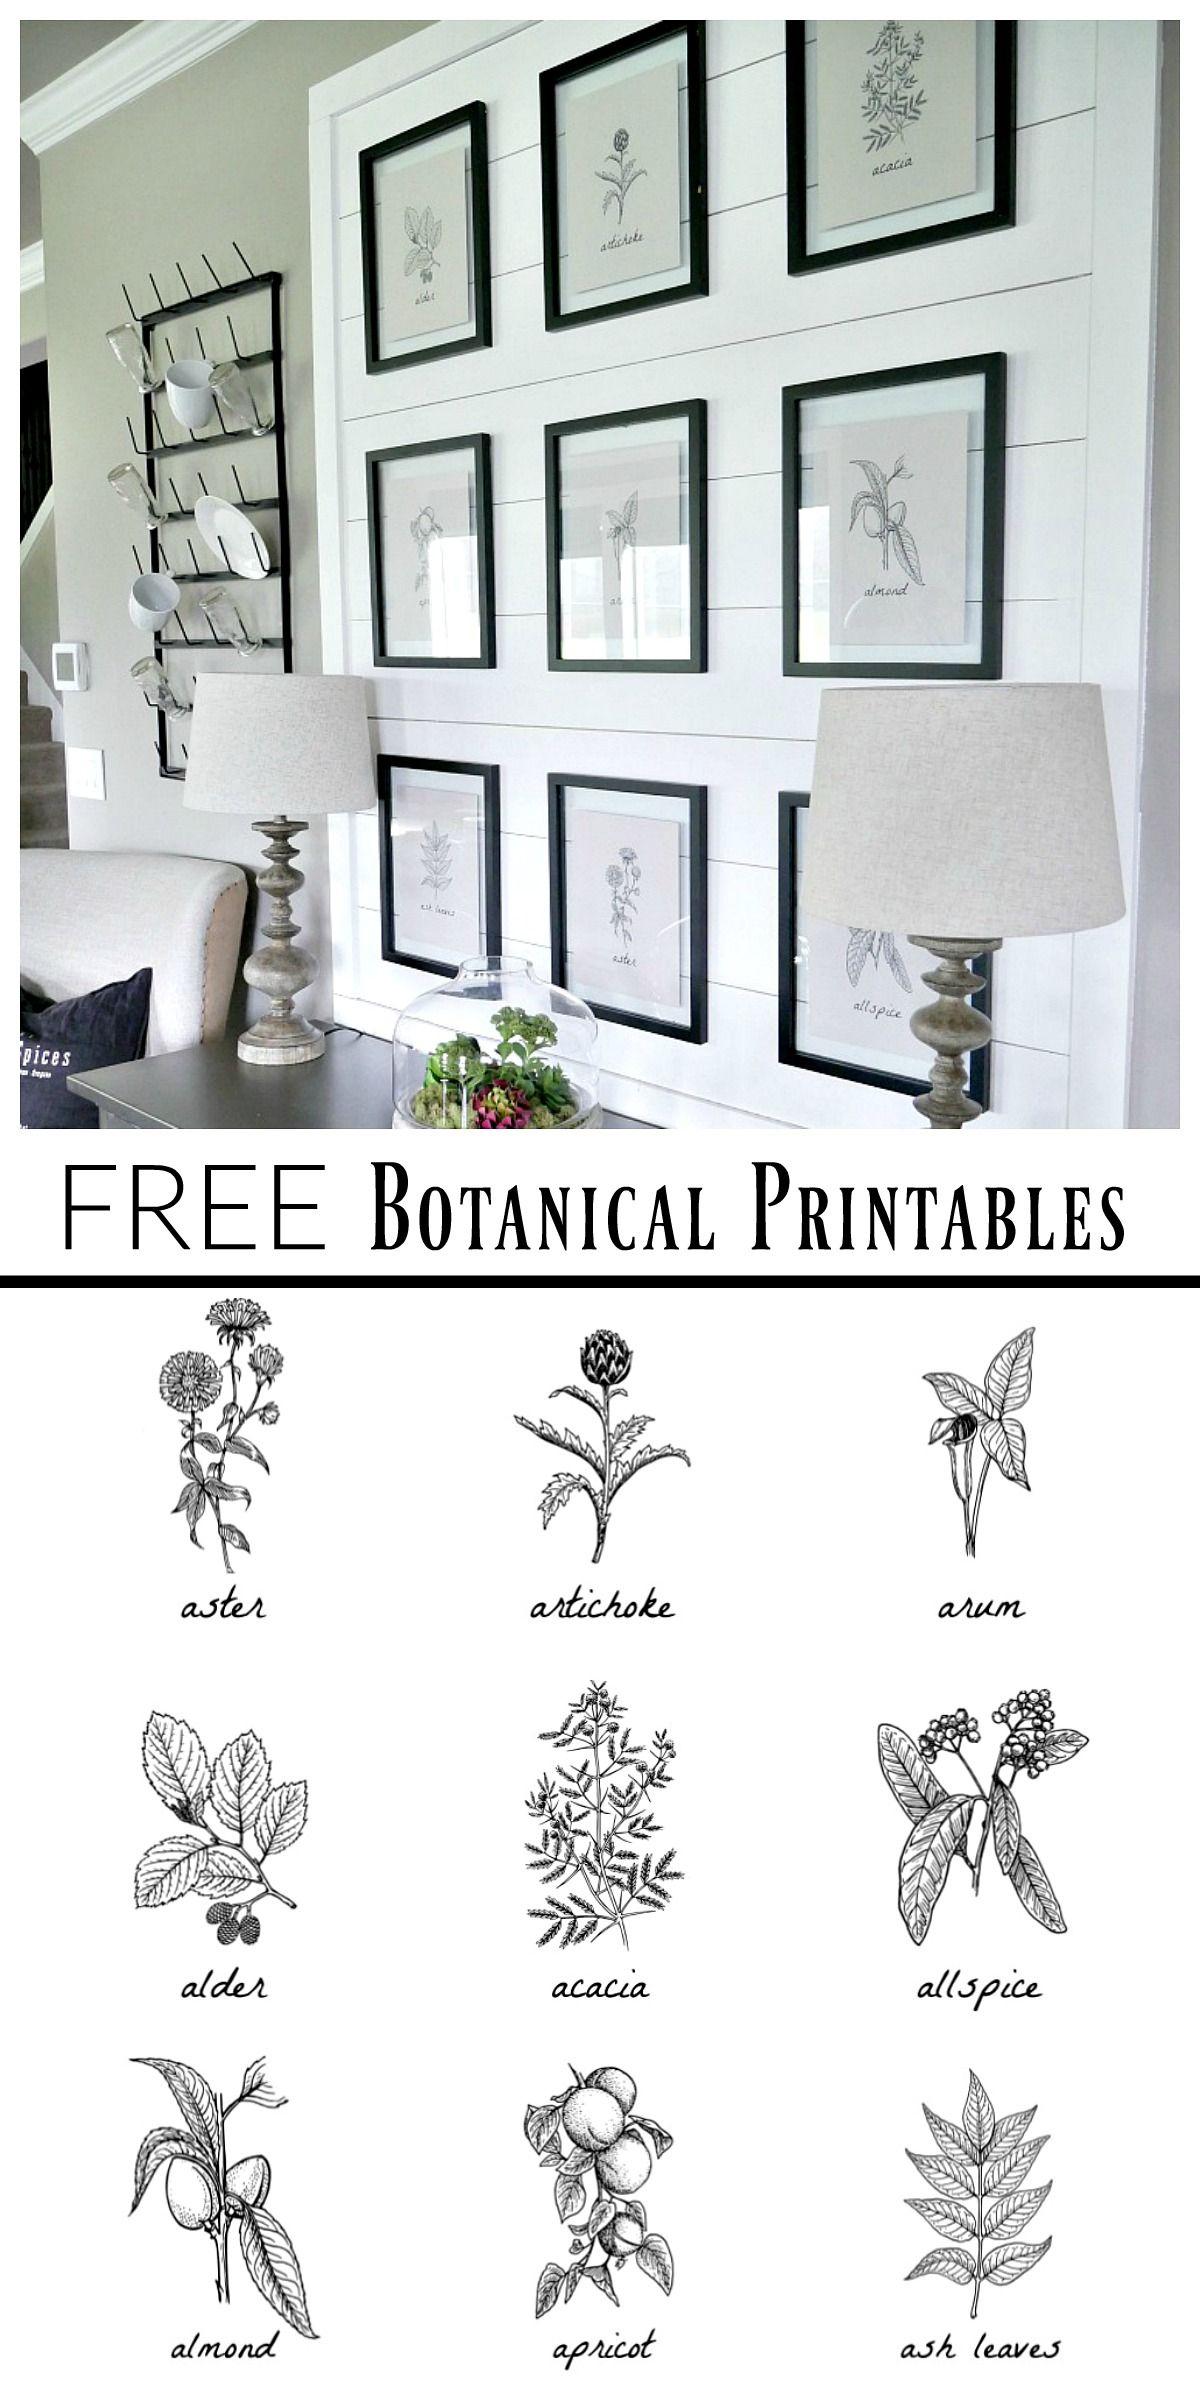 Free Botanical Prints | Bloggers' Best Diy Ideas | Diy Wall Art - Free Black And White Printable Art